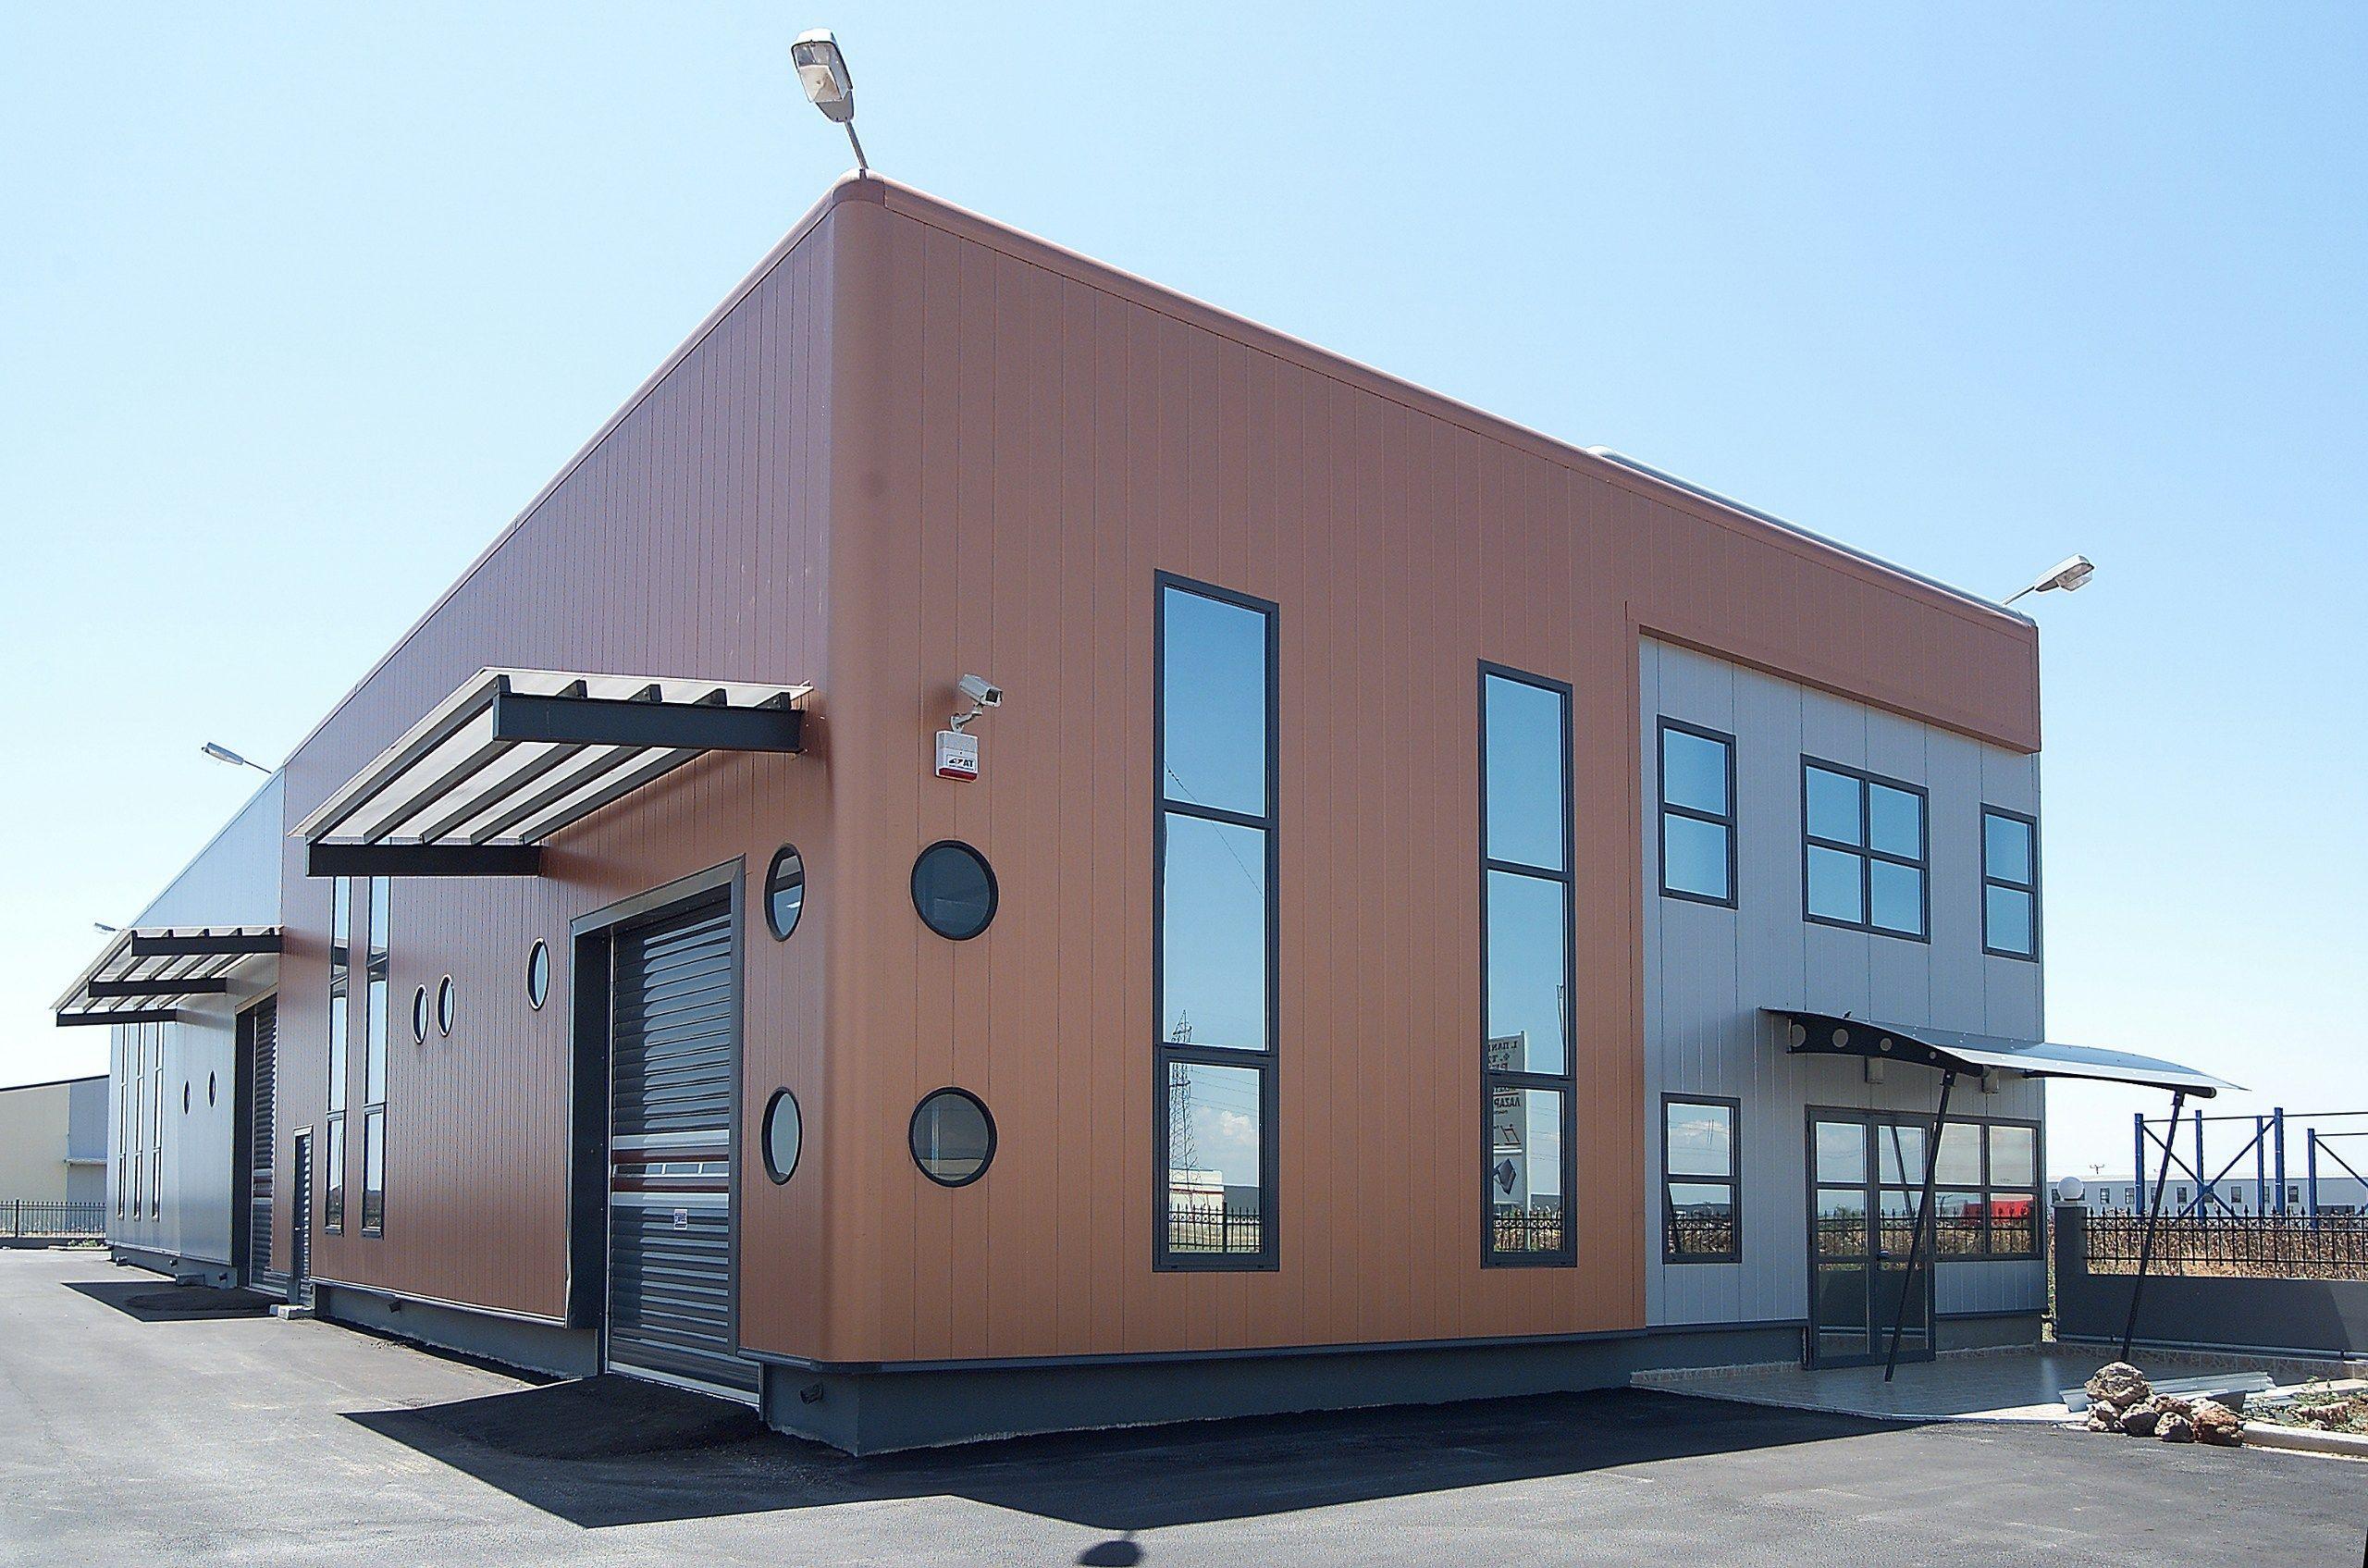 Metal Panel Facade : Insulated metal panel for facade termopareti wpm c by